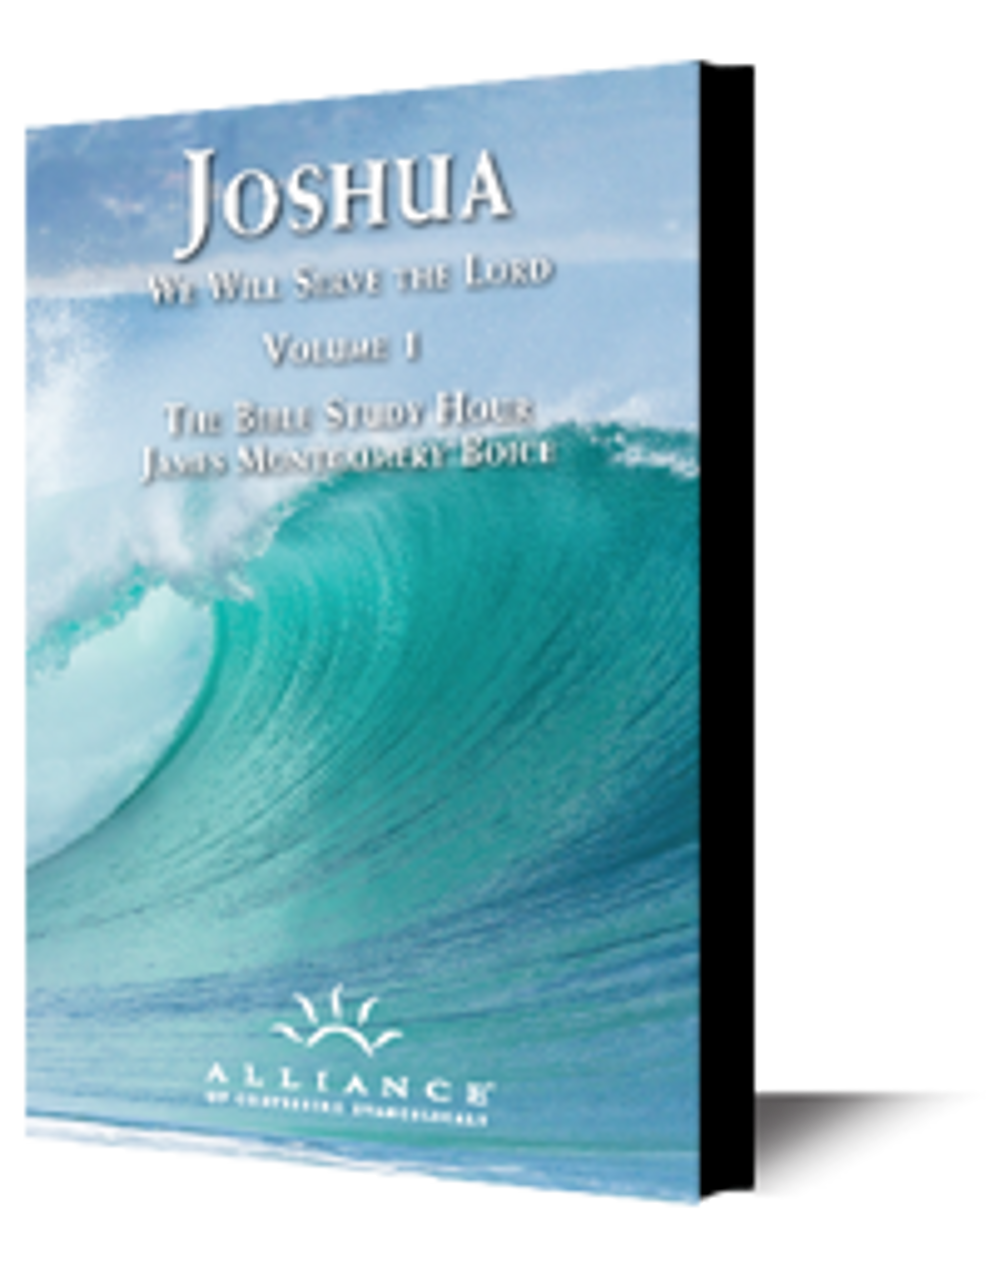 Joshua, Volume 1 (CD Set)